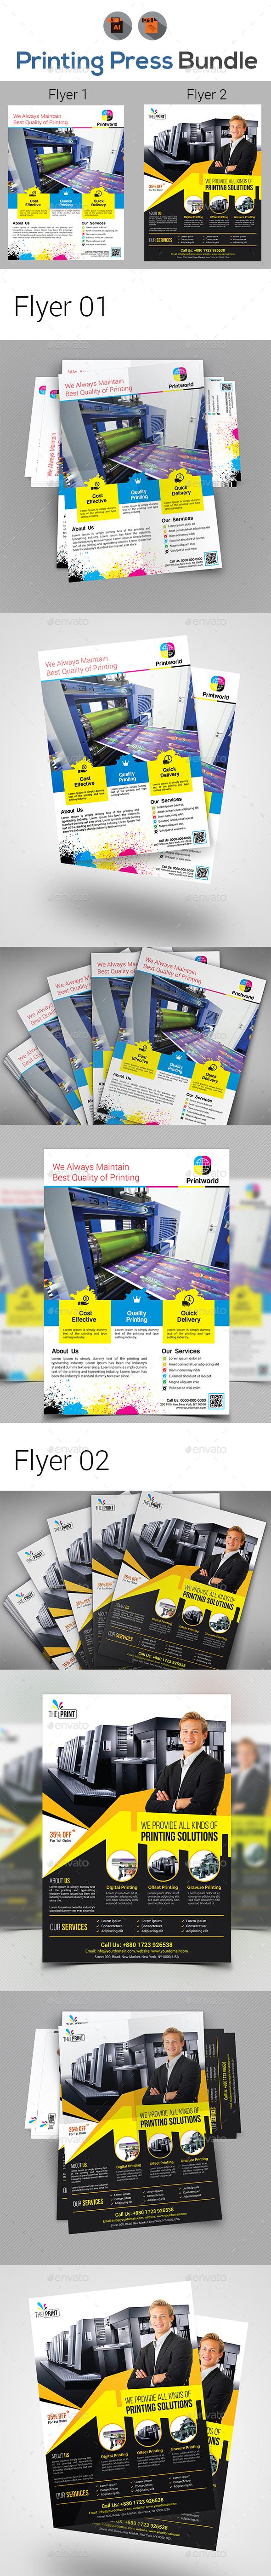 Printing Press / Print Shop Flyer Bundle - Print Templates